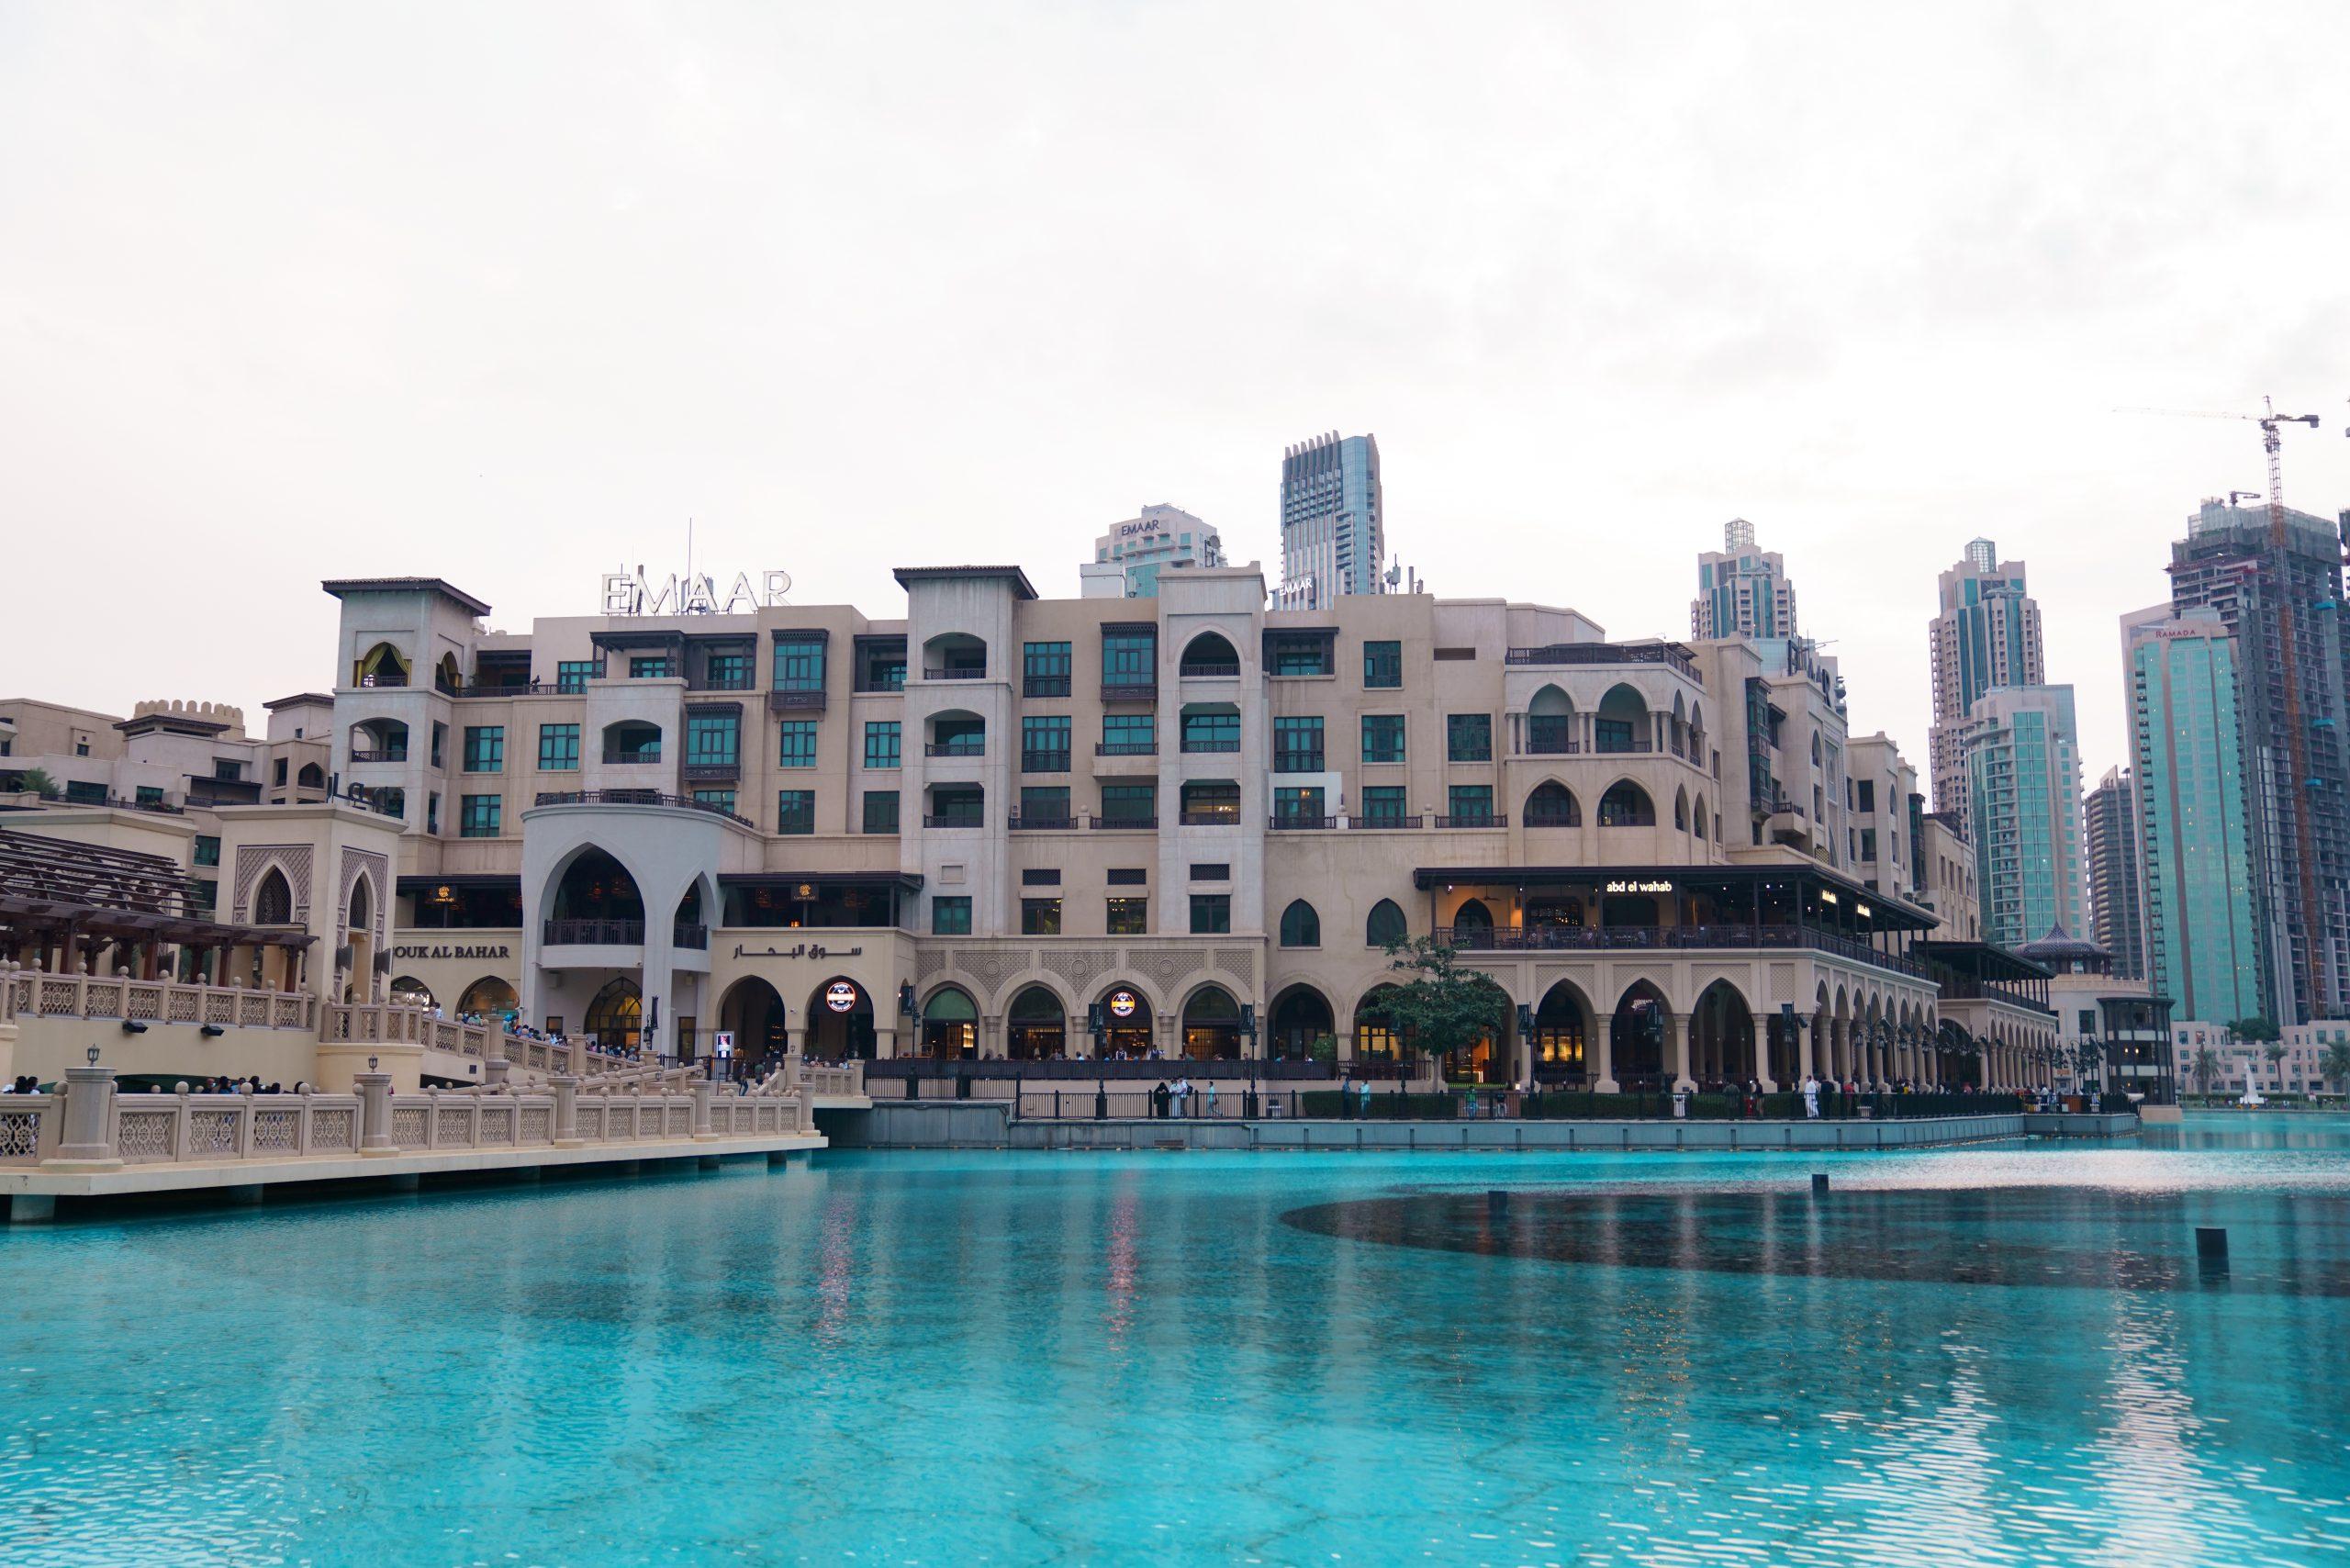 Buildings and water pool